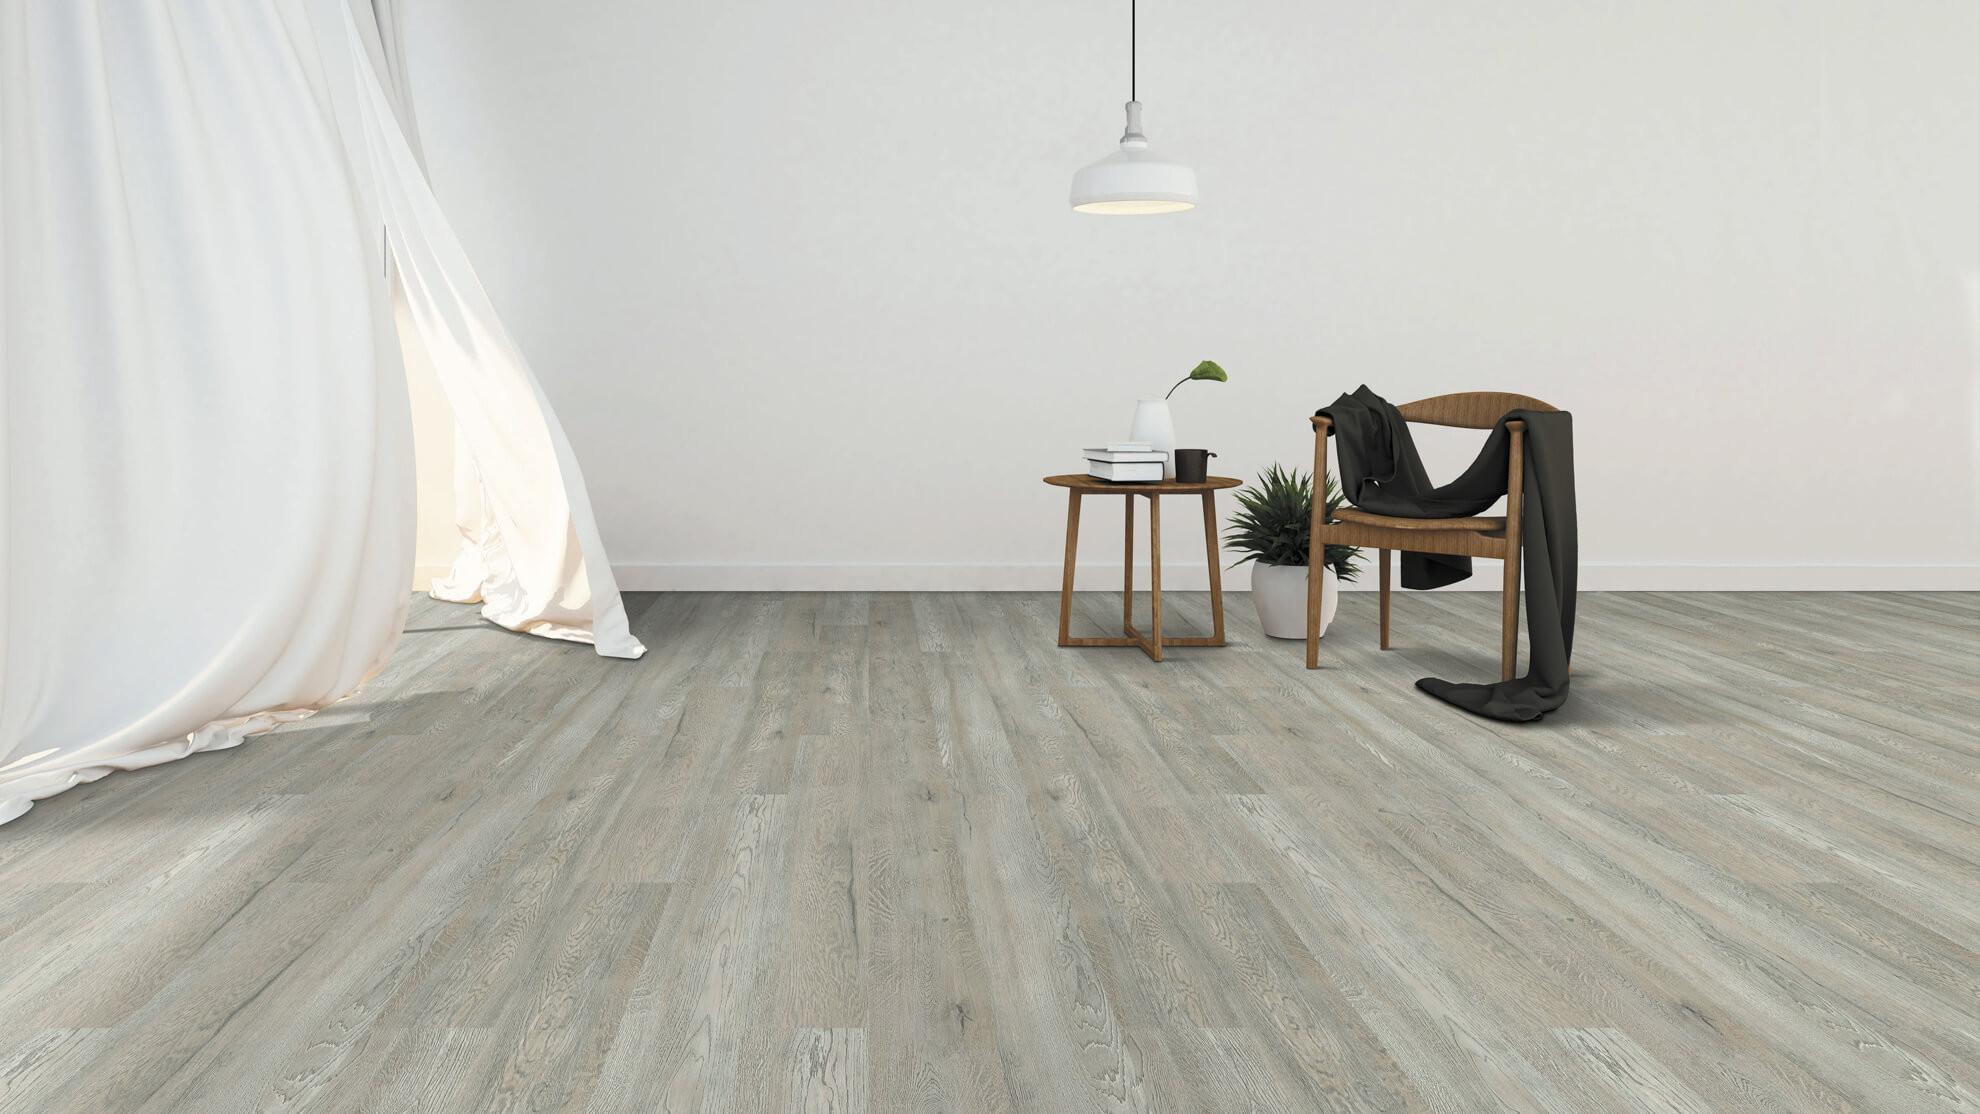 24 Fabulous Hardwood Vinyl Sheet Flooring 2021 free download hardwood vinyl sheet flooring of earthwerks flooring inside noble classic plus alaska oak ncr 9708